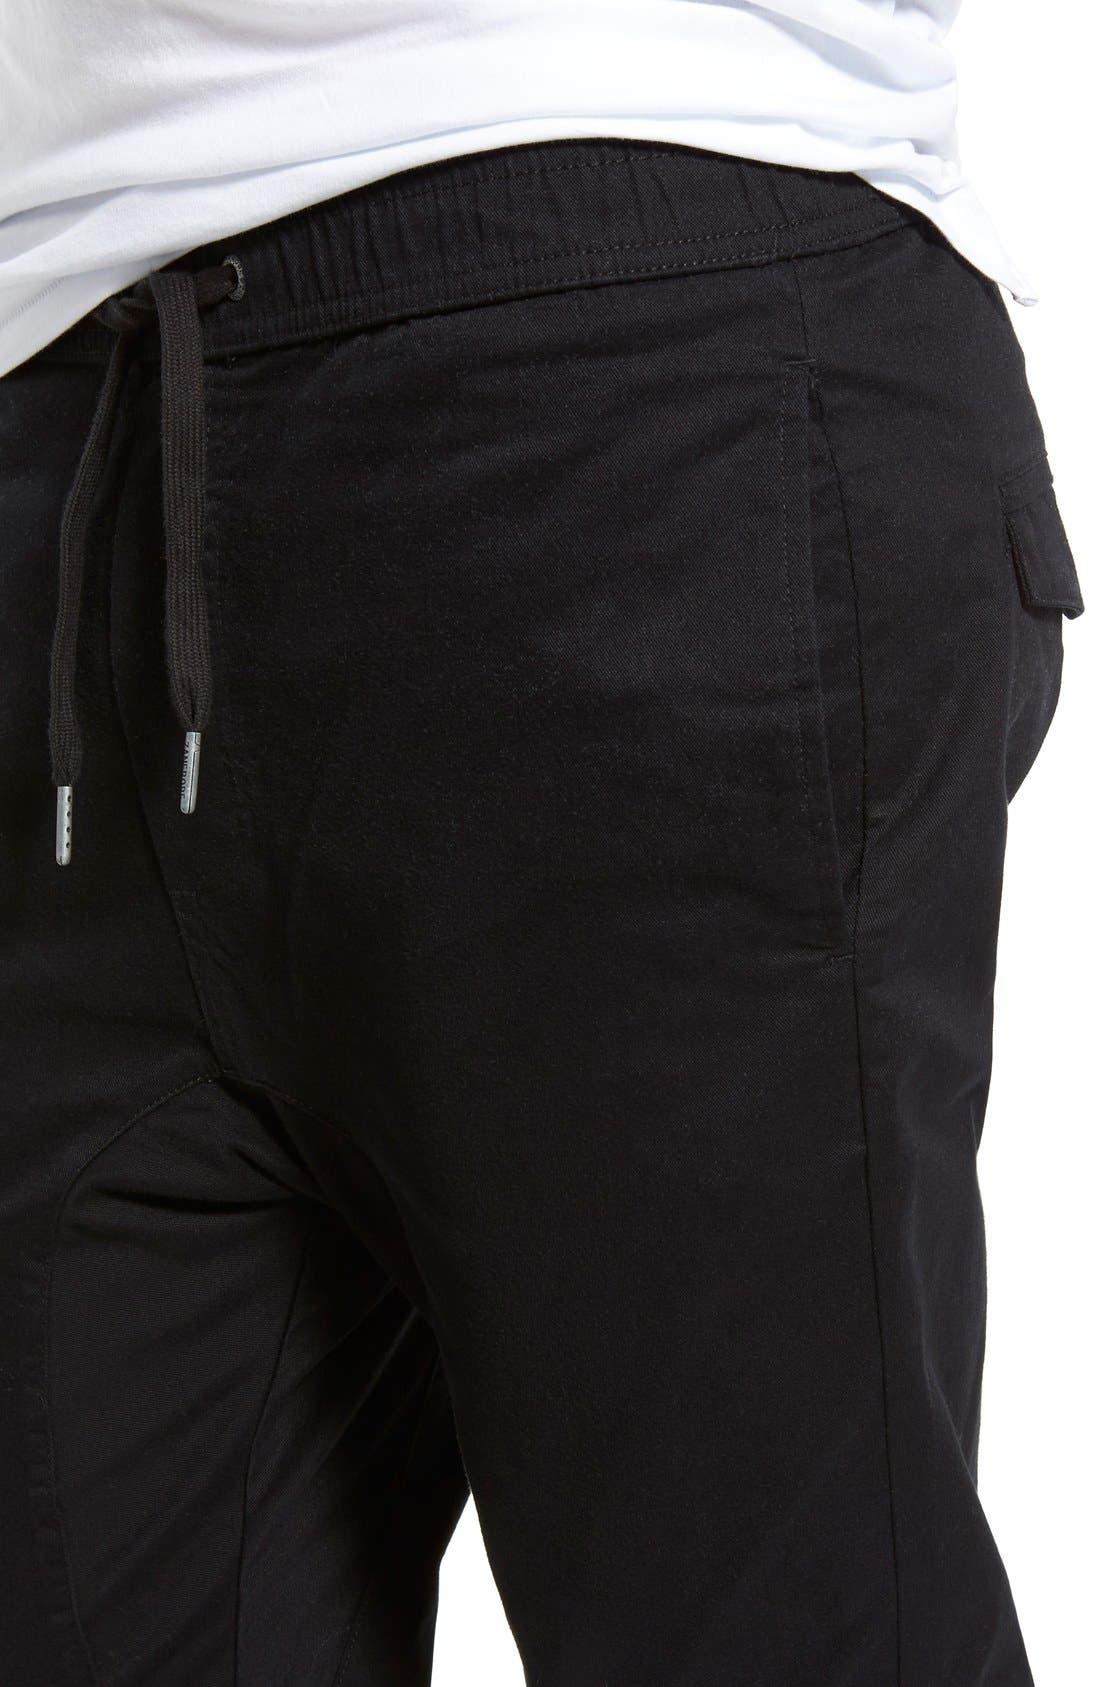 Salerno Stretch Woven Jogger Pants,                             Alternate thumbnail 4, color,                             BLACK